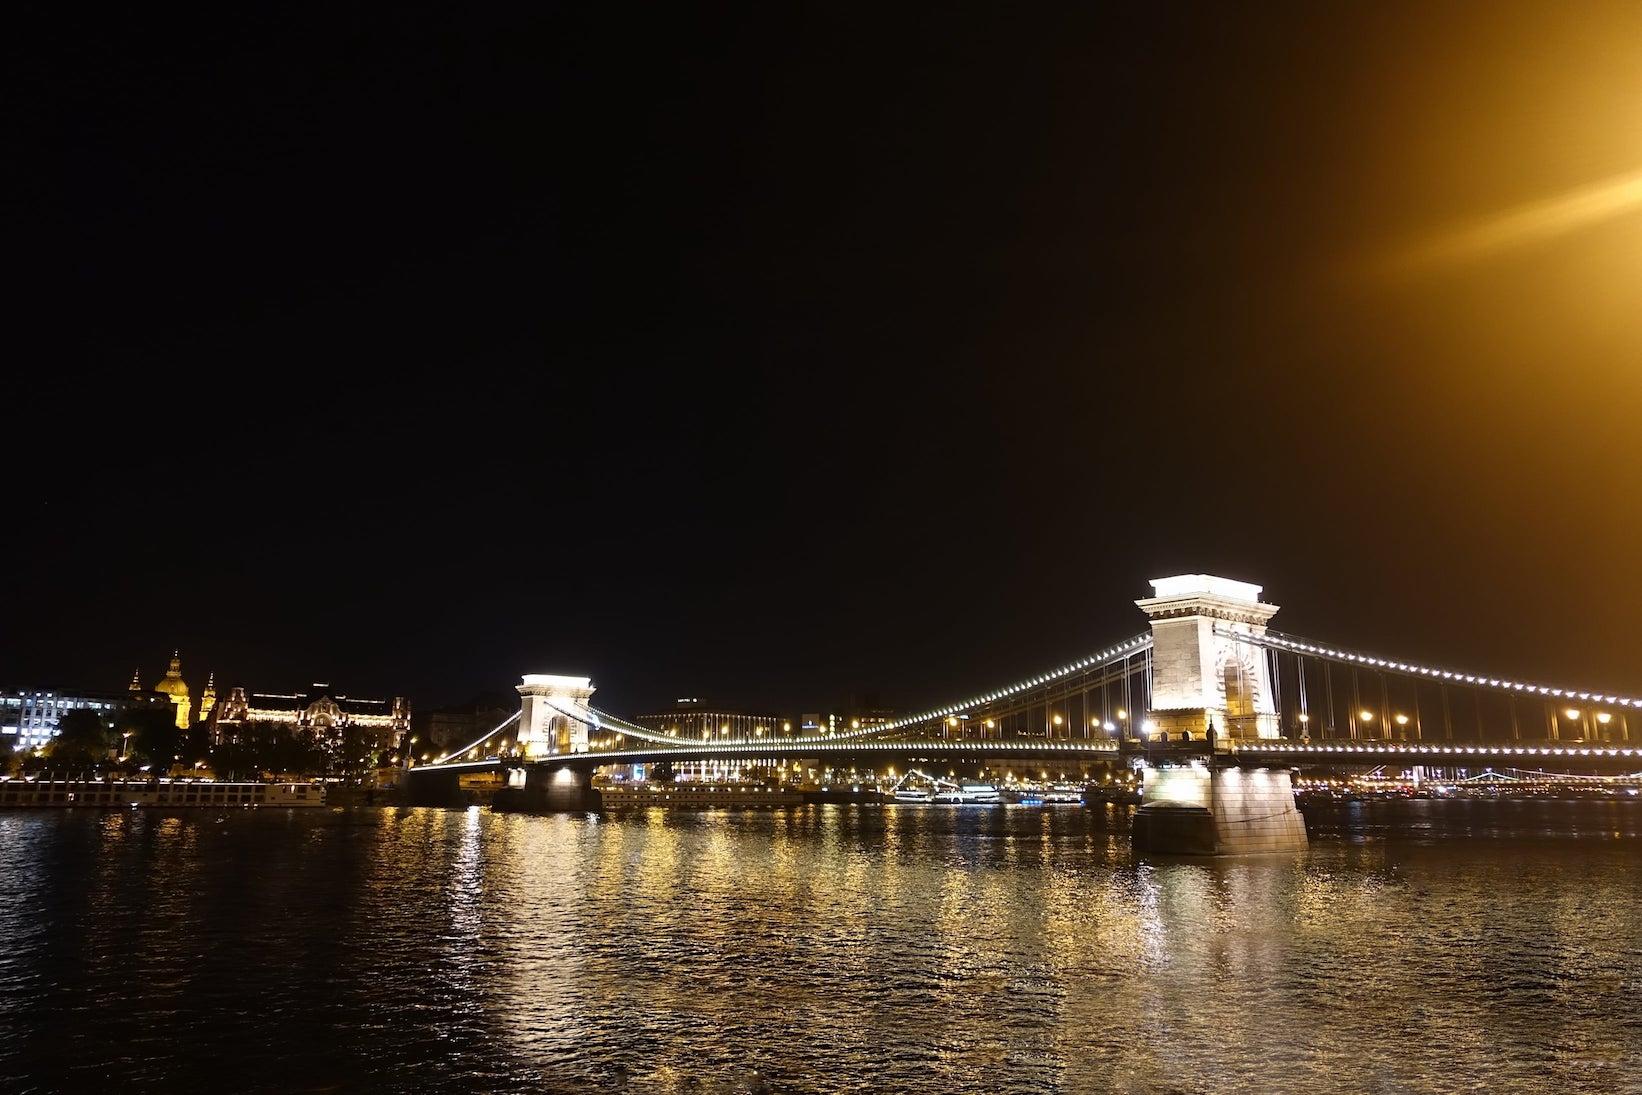 Euruko 2017 - Budapest at first glance